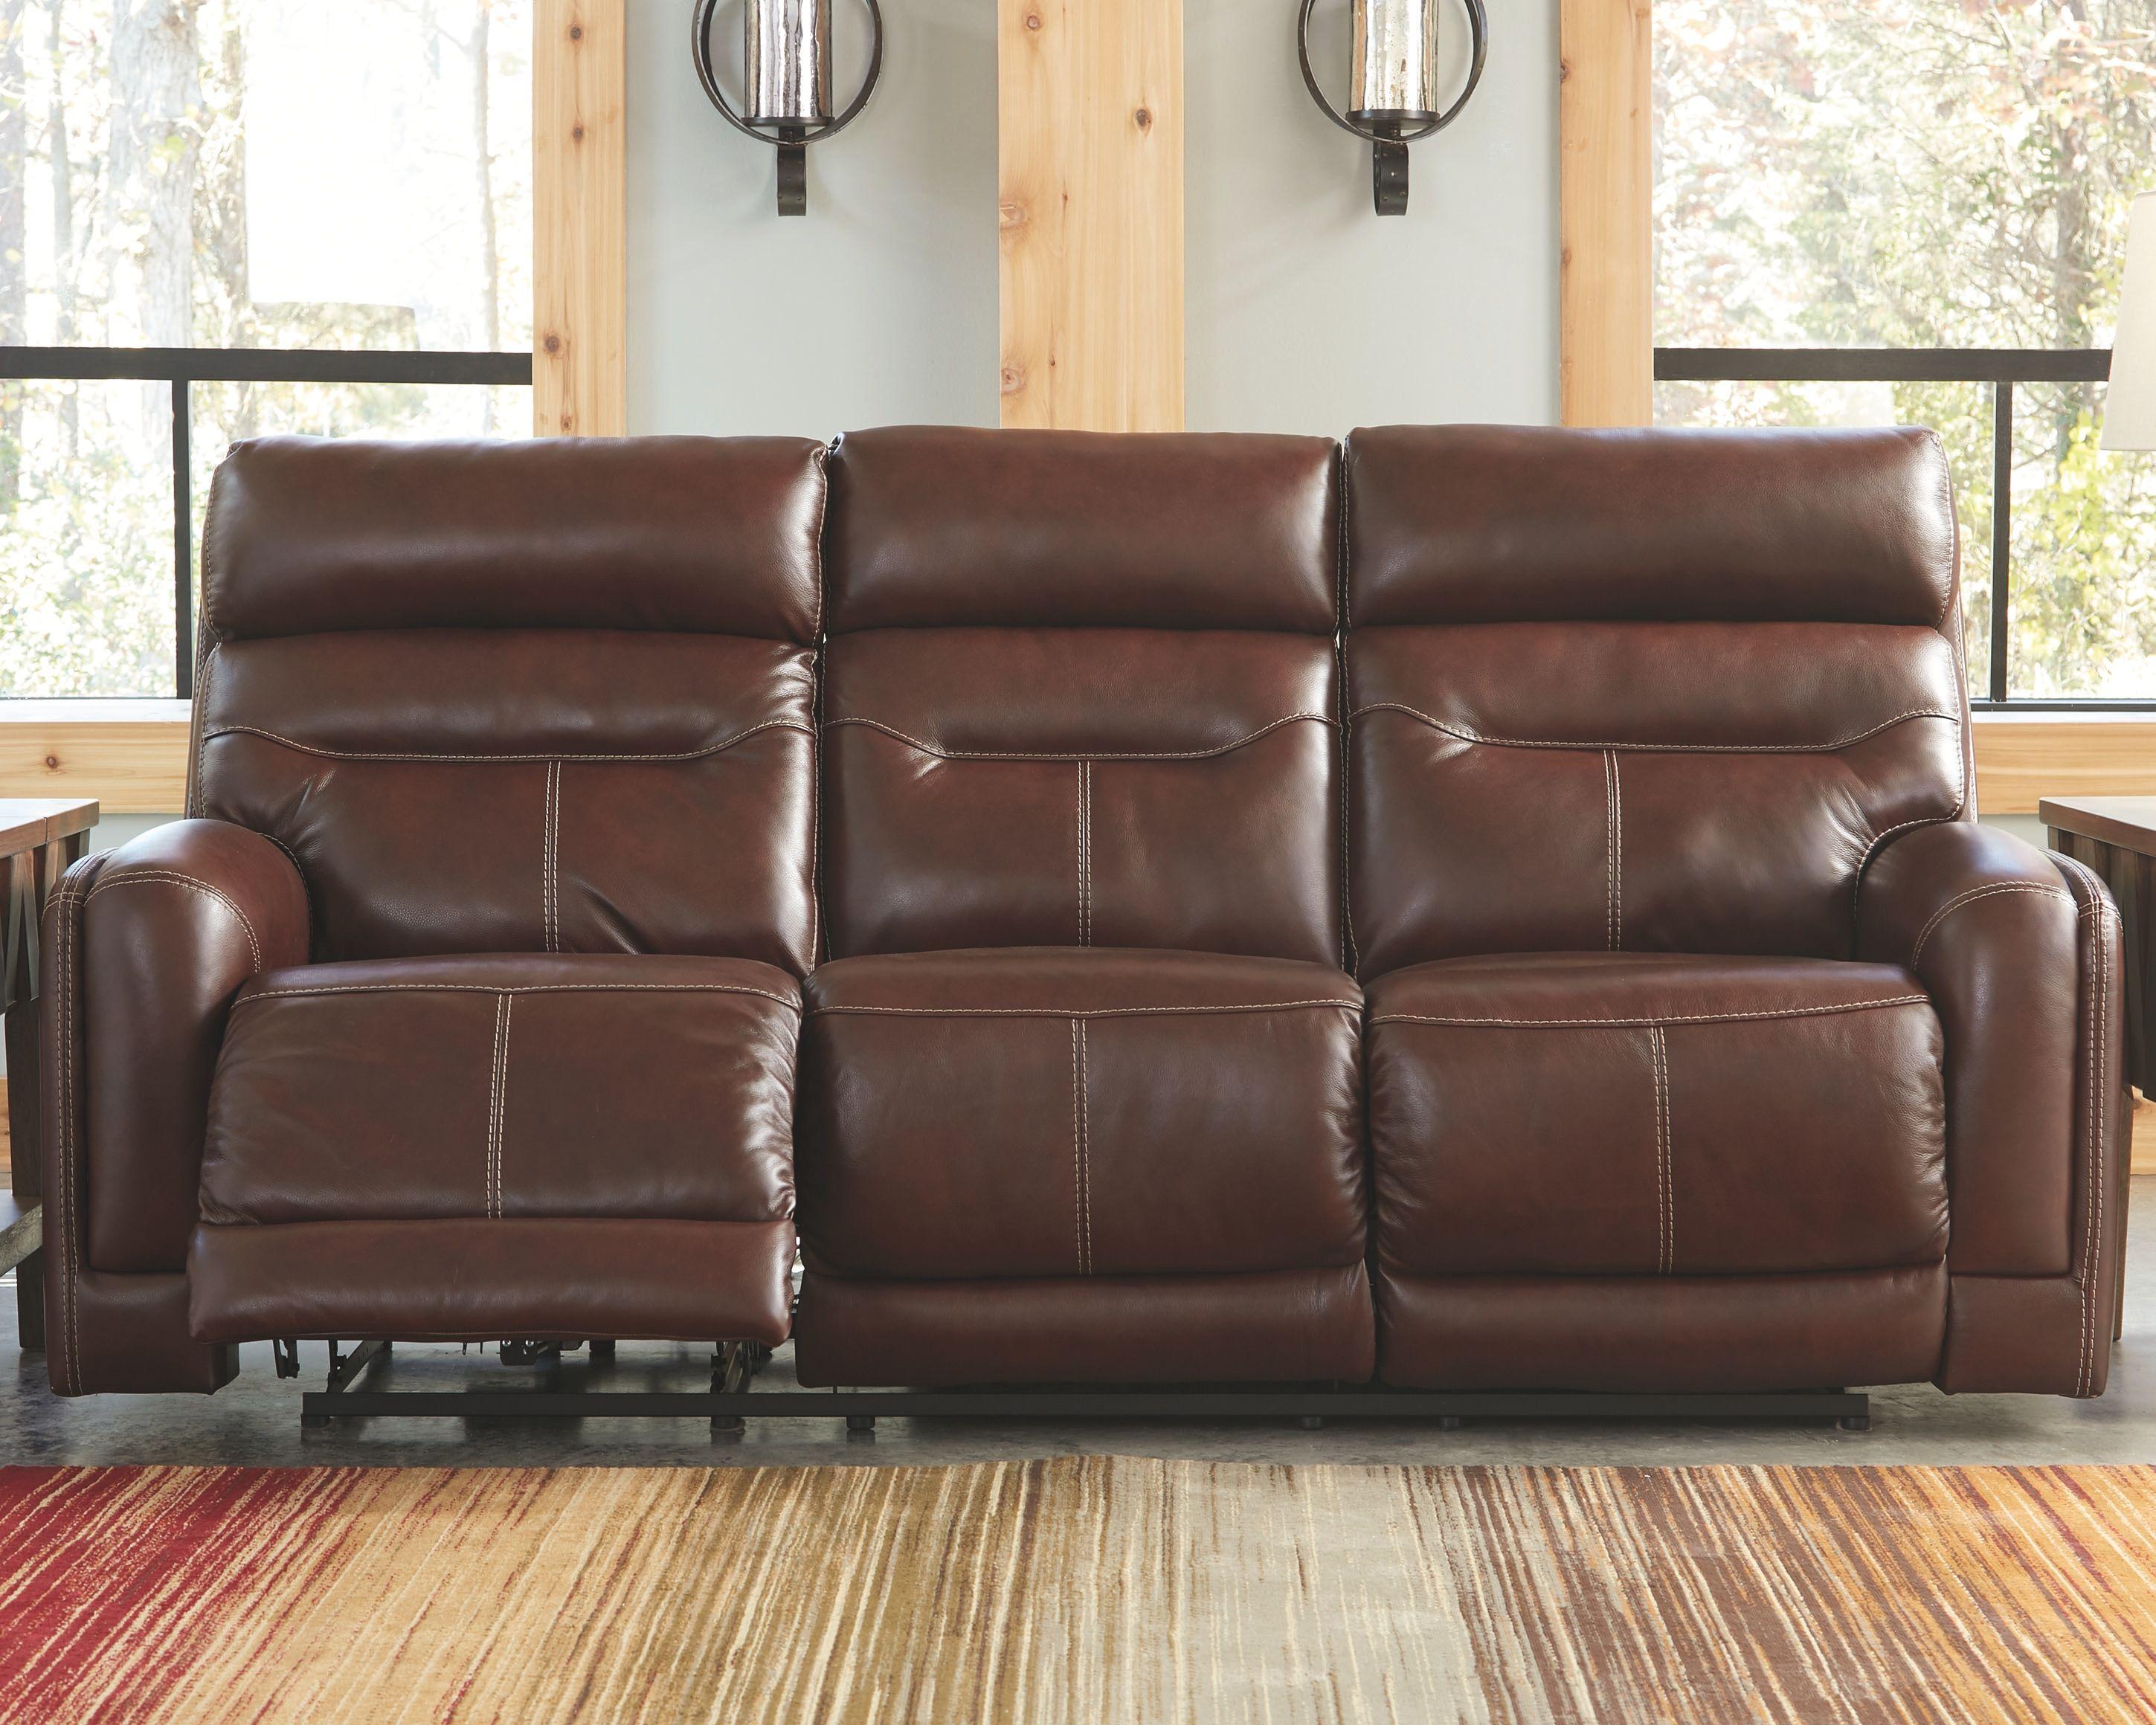 Sessom Power Reclining Sofa Ashley Furniture Homestore Power Reclining Sofa Reclining Sofa Power Recliners